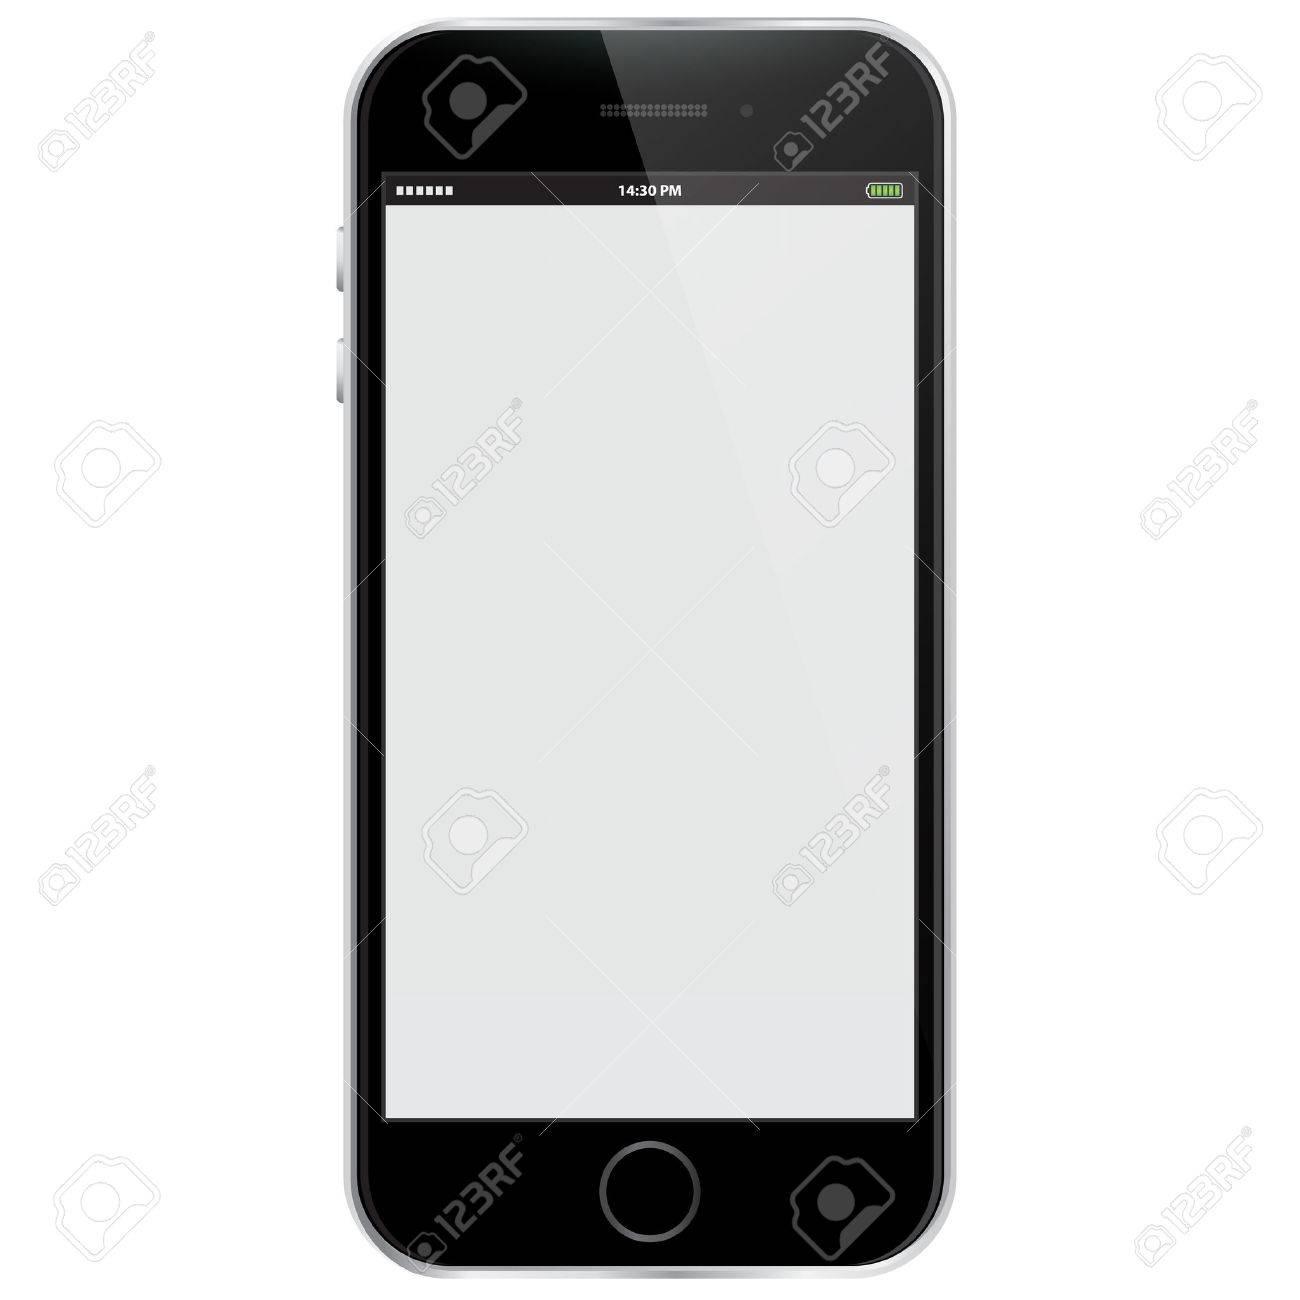 Realistic Vector Mobile Phone - Black - 45723231